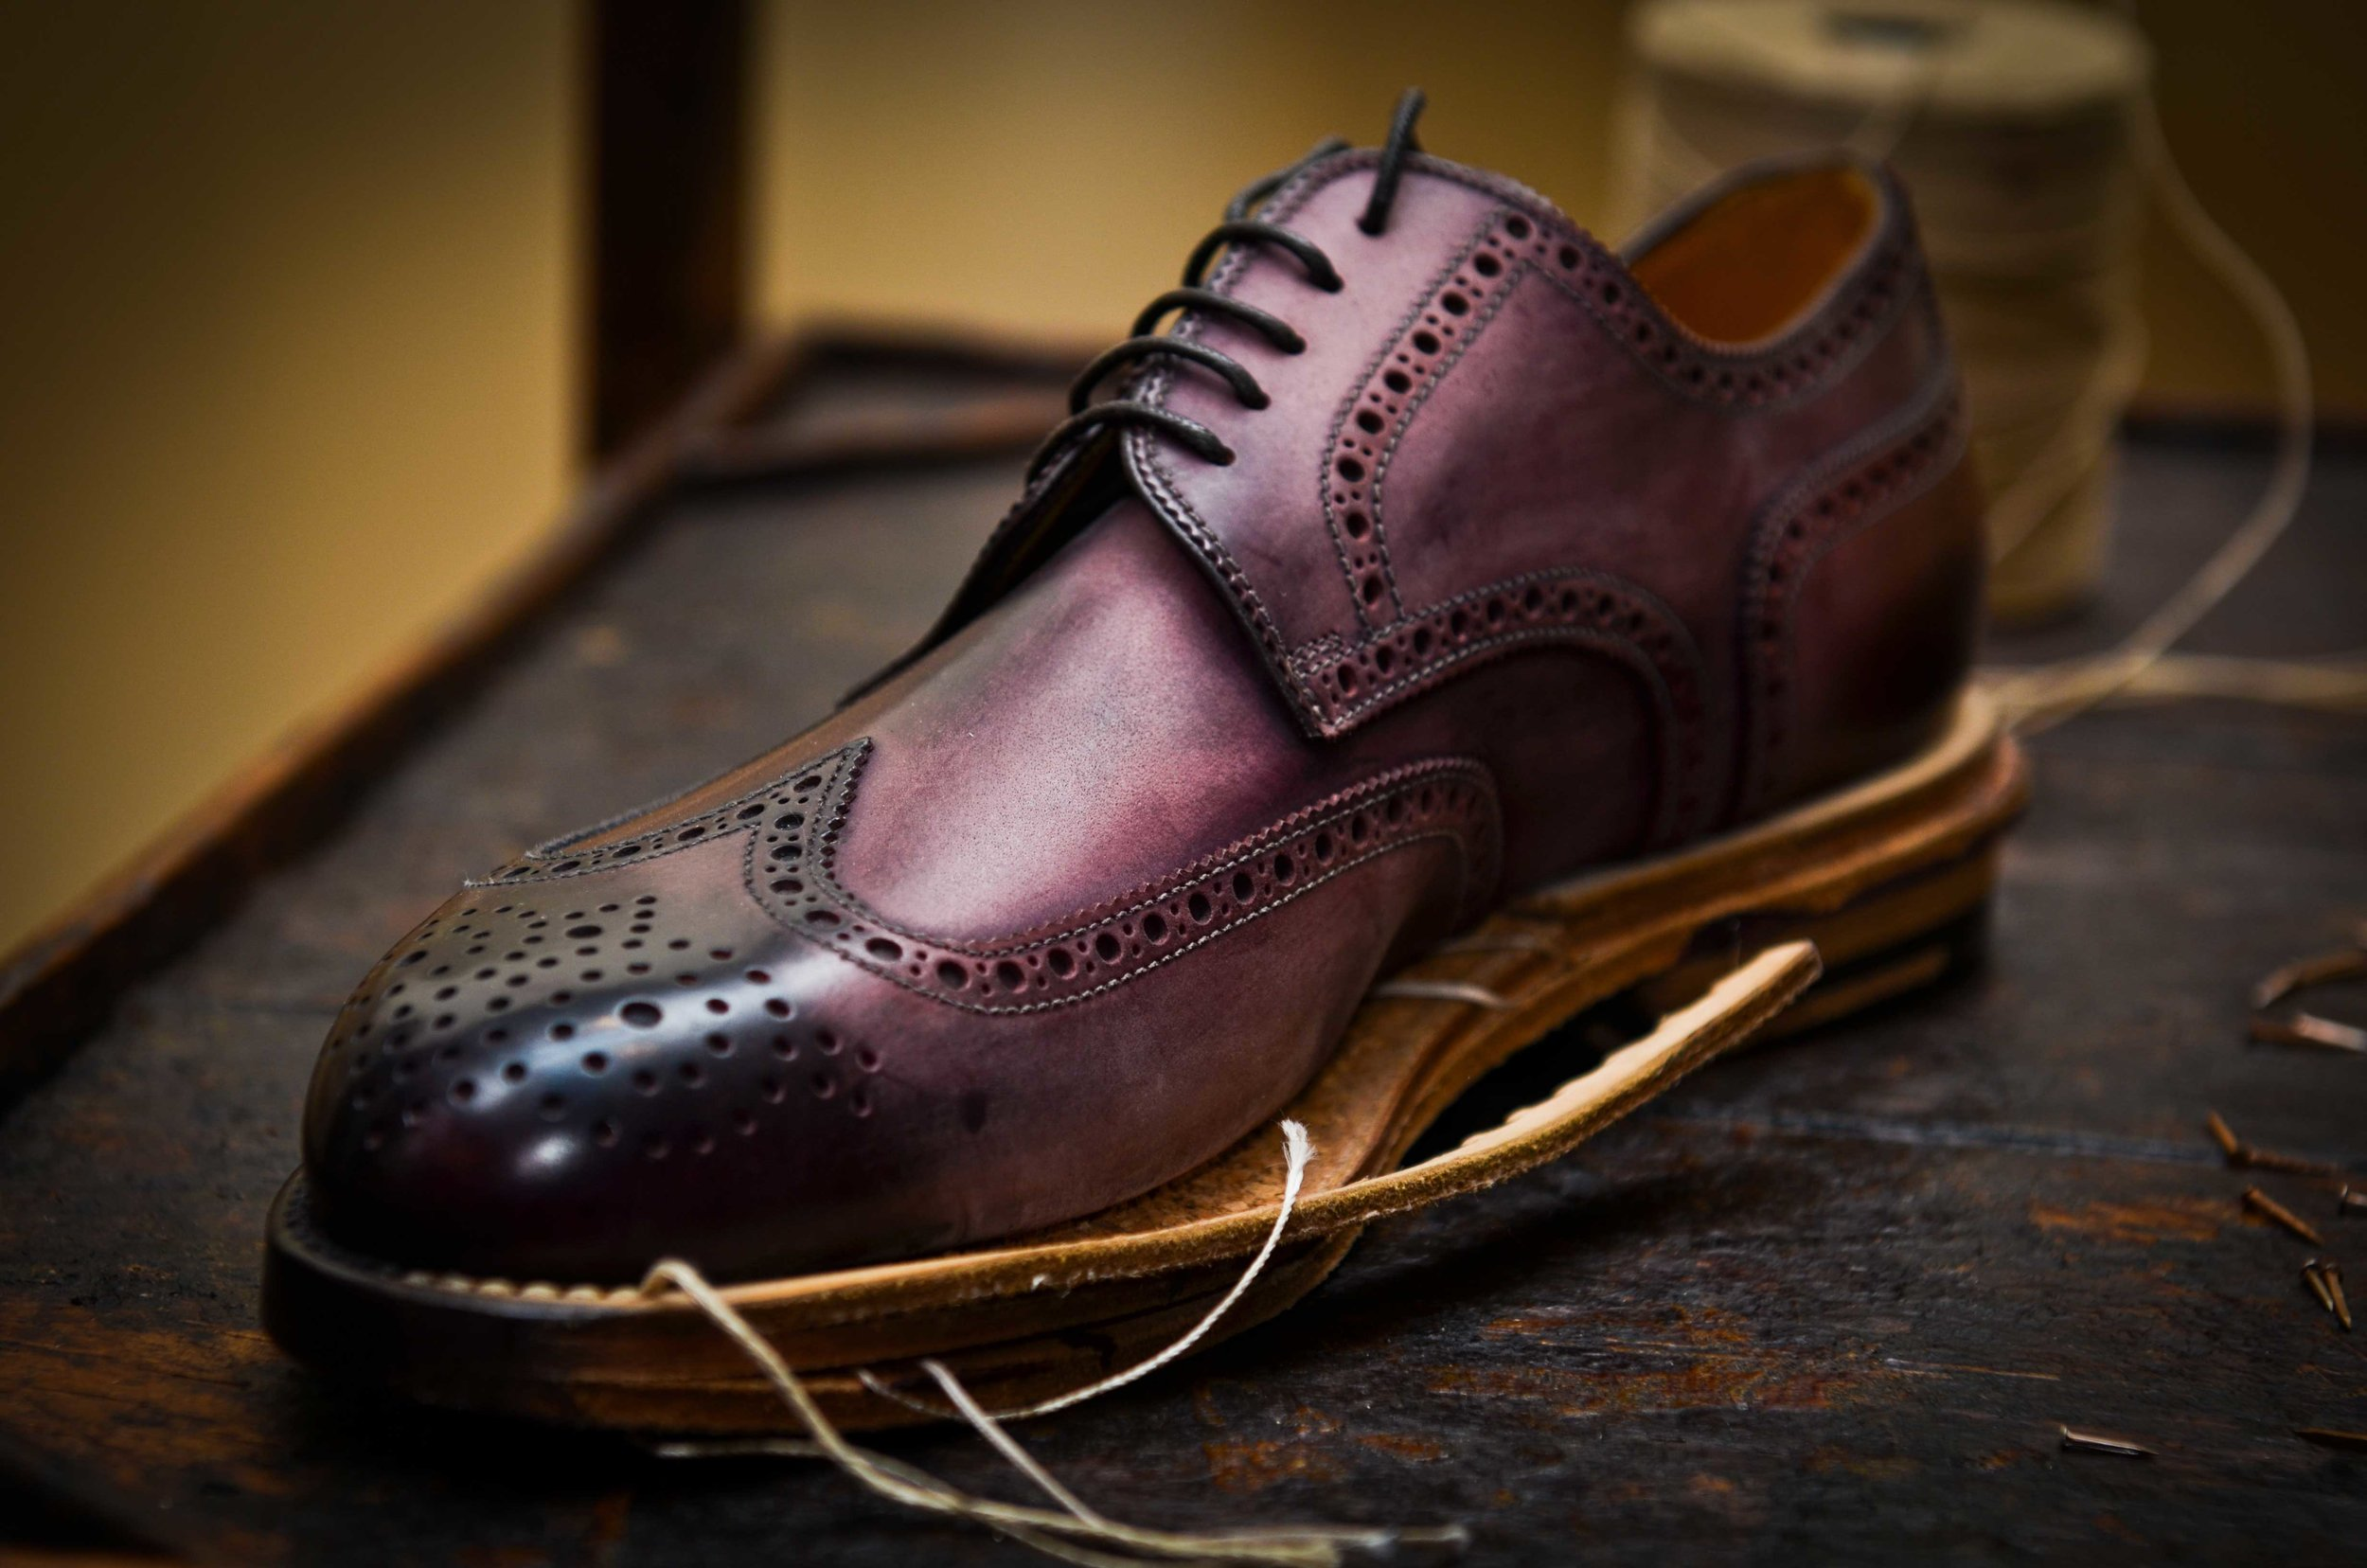 Shoes-in-the-making---boty-ve-vyrobe.jpg